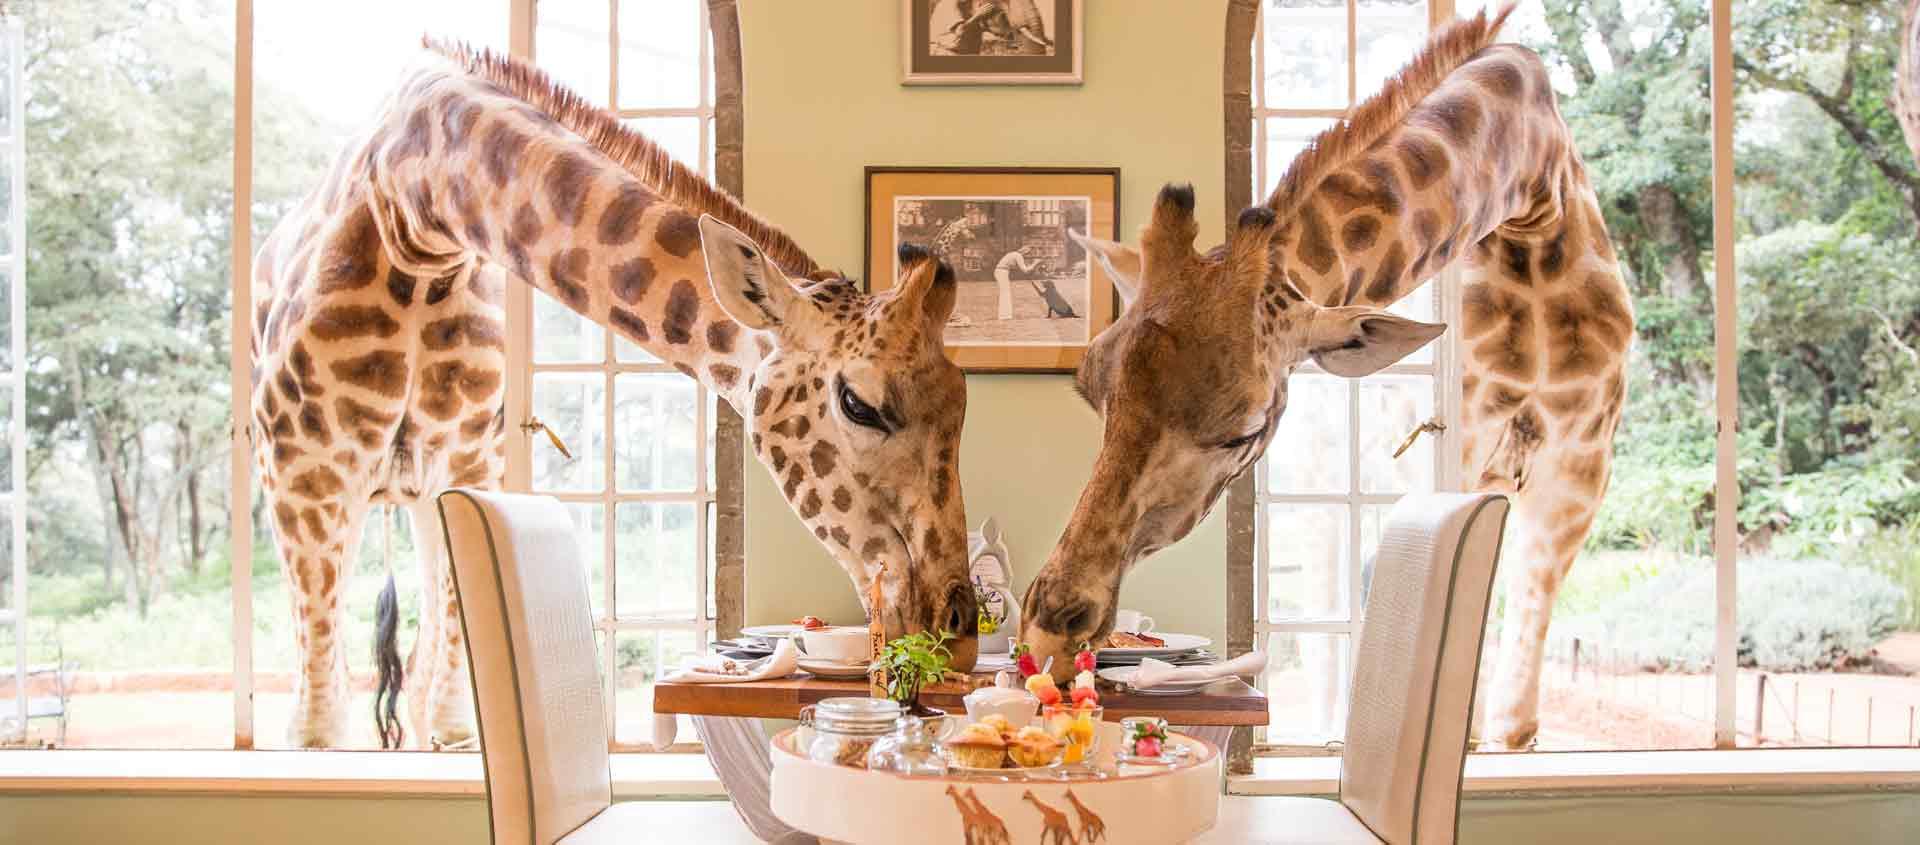 Kenya Private Wildlife Reserves image of giraffes at Giraffe Manor